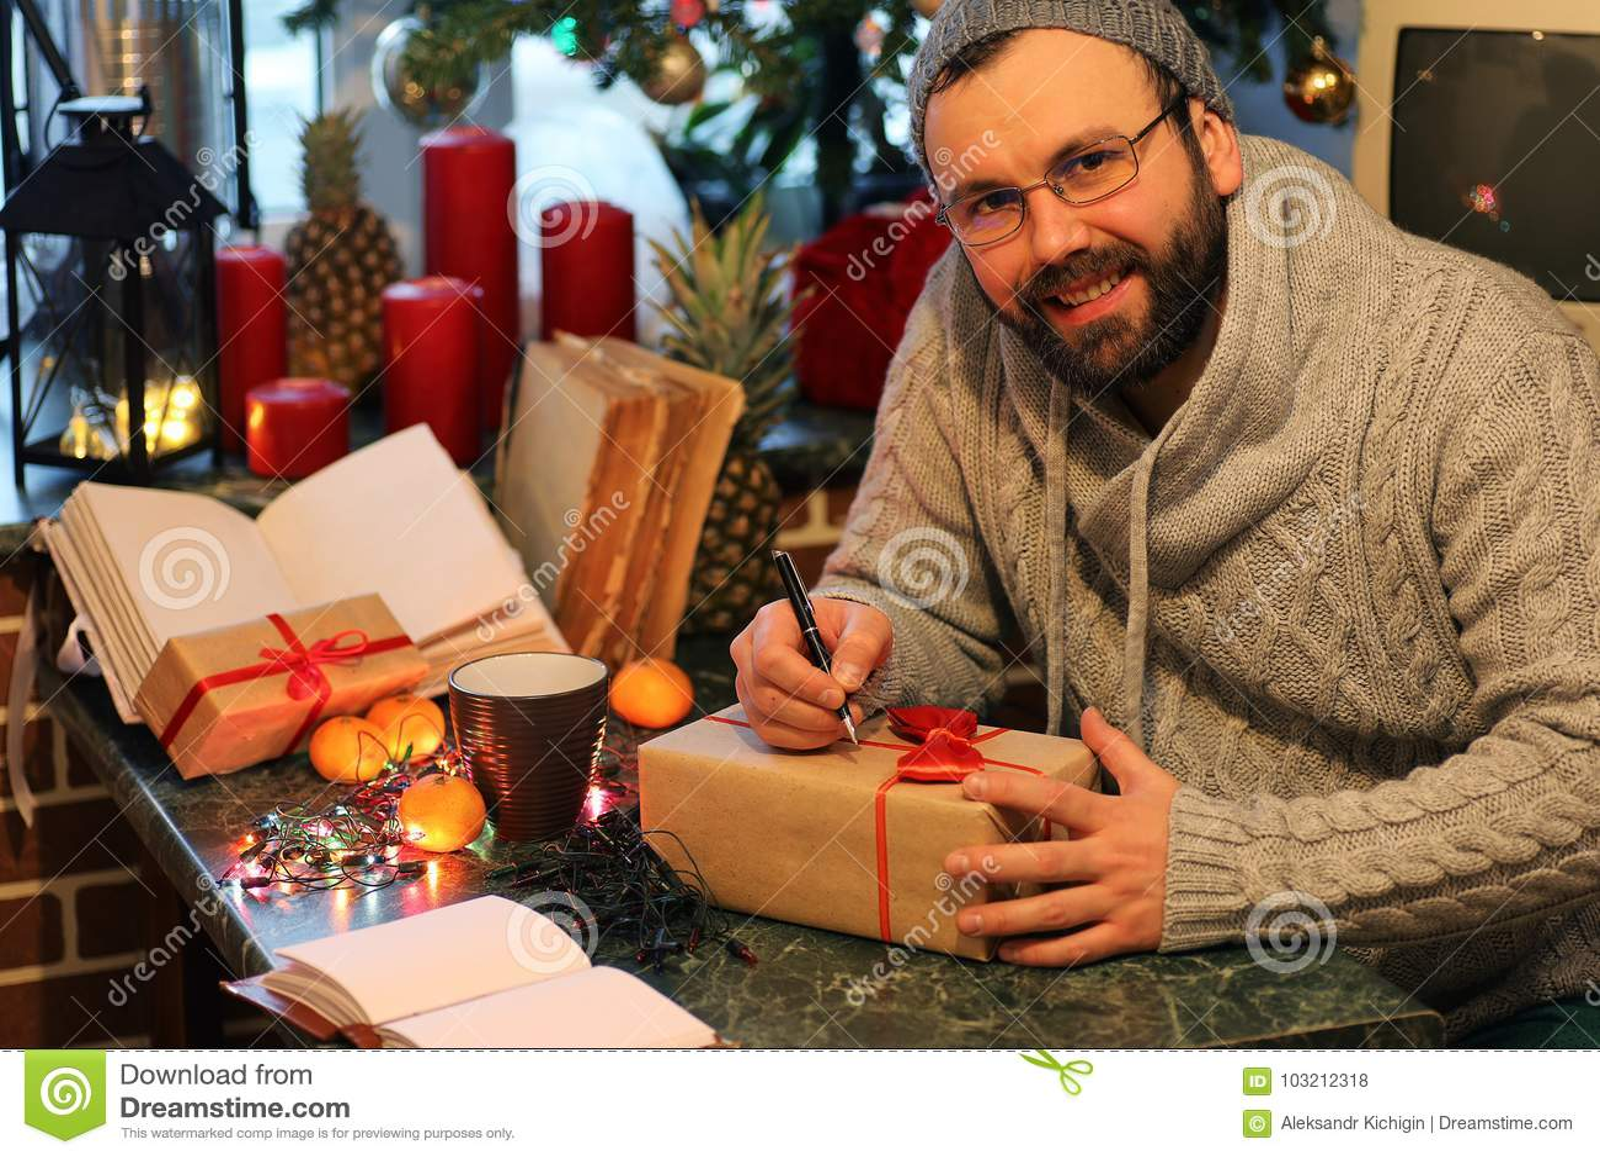 Beard Man Writing Christmas Gifts On A Table Stock Photo - Image of ...